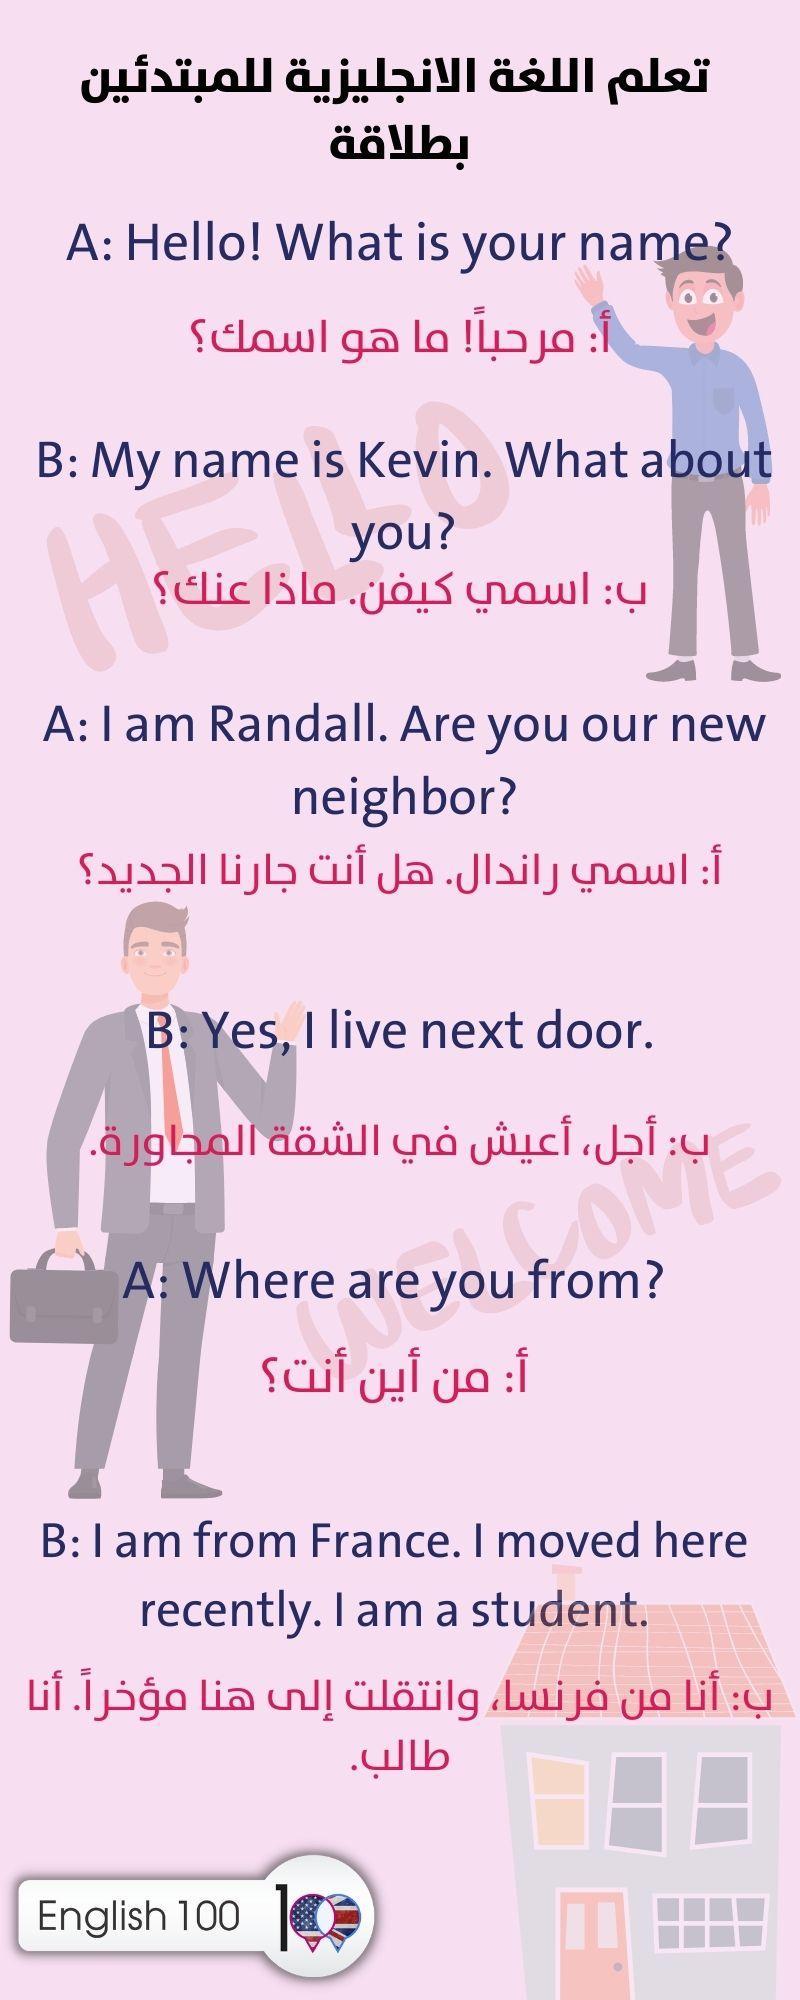 محادثه بين شخصين بالانقلش قصيره A Short Conversation in English between 2 People